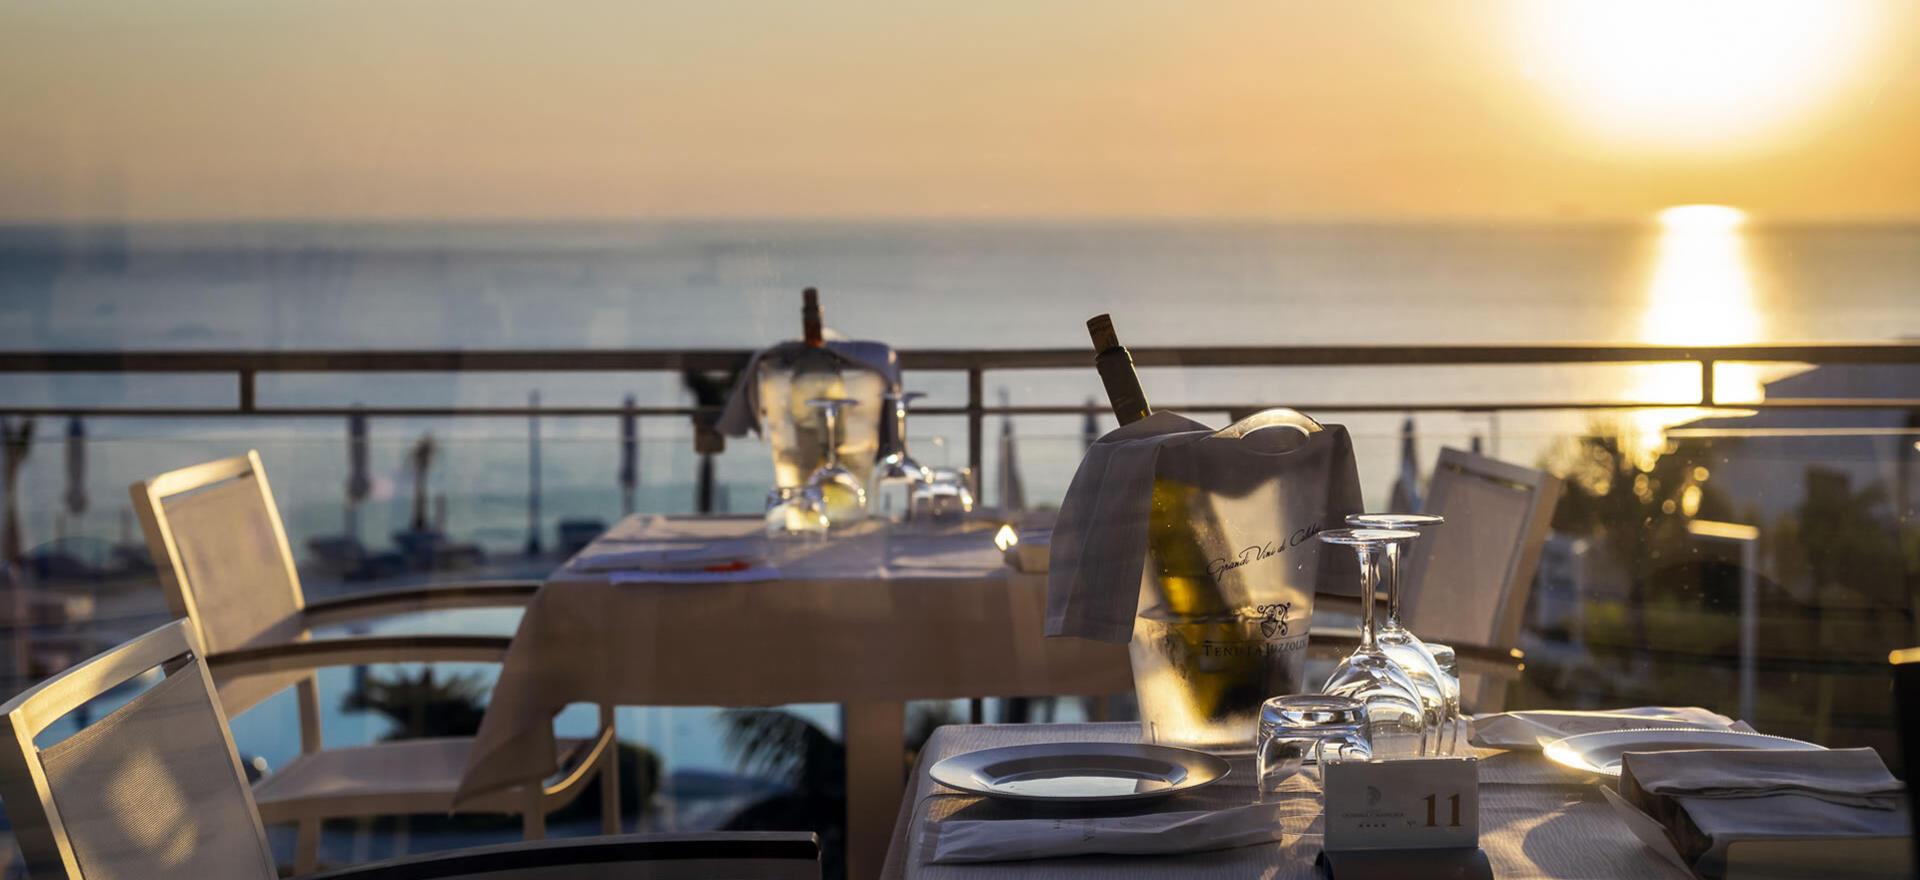 borgodonnacanfora fr restaurant 001